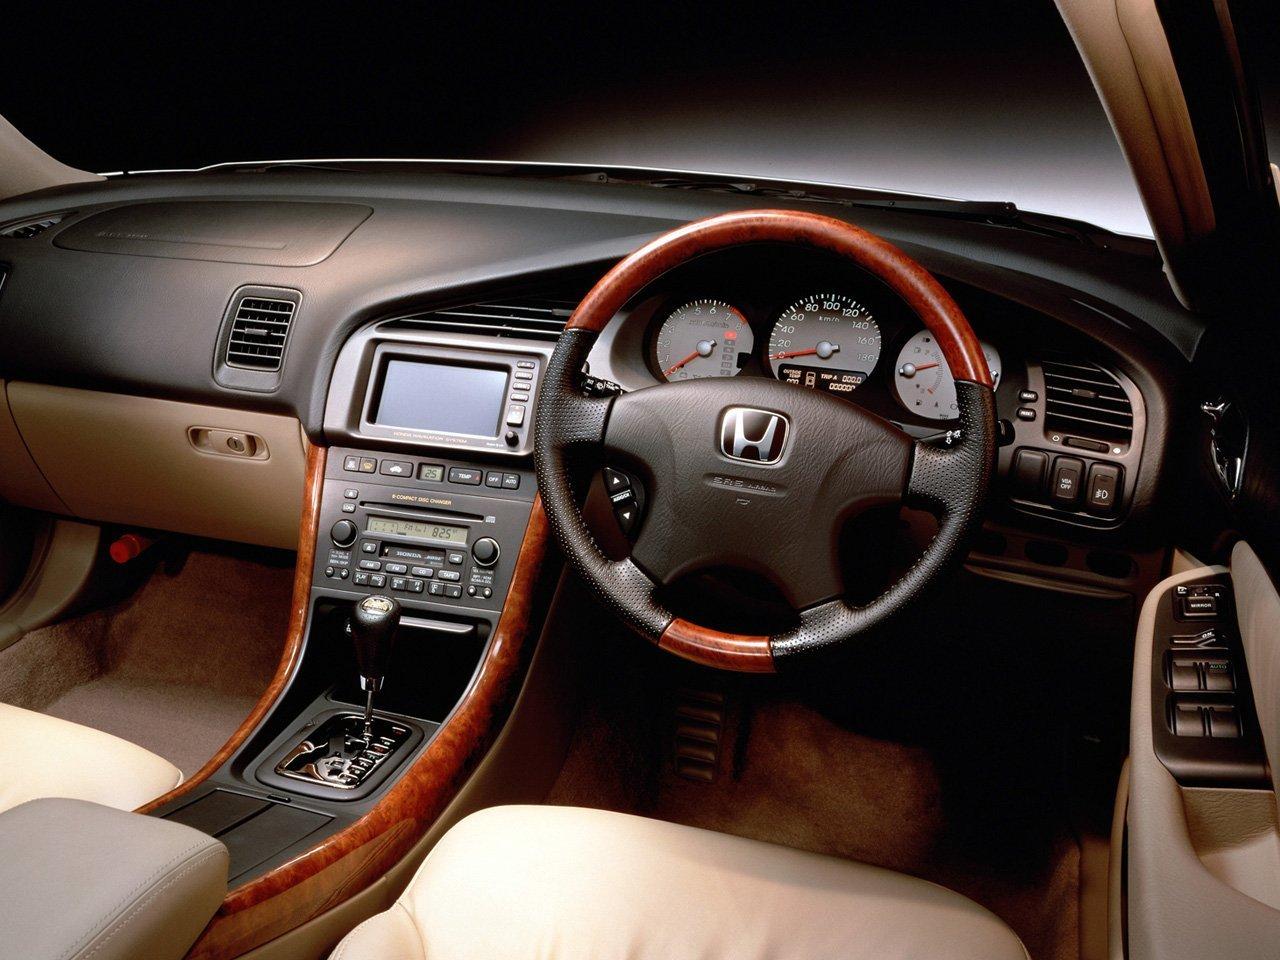 Седан honda inspire 2001 - 2003г выпуска модификация 25 at (200 лс